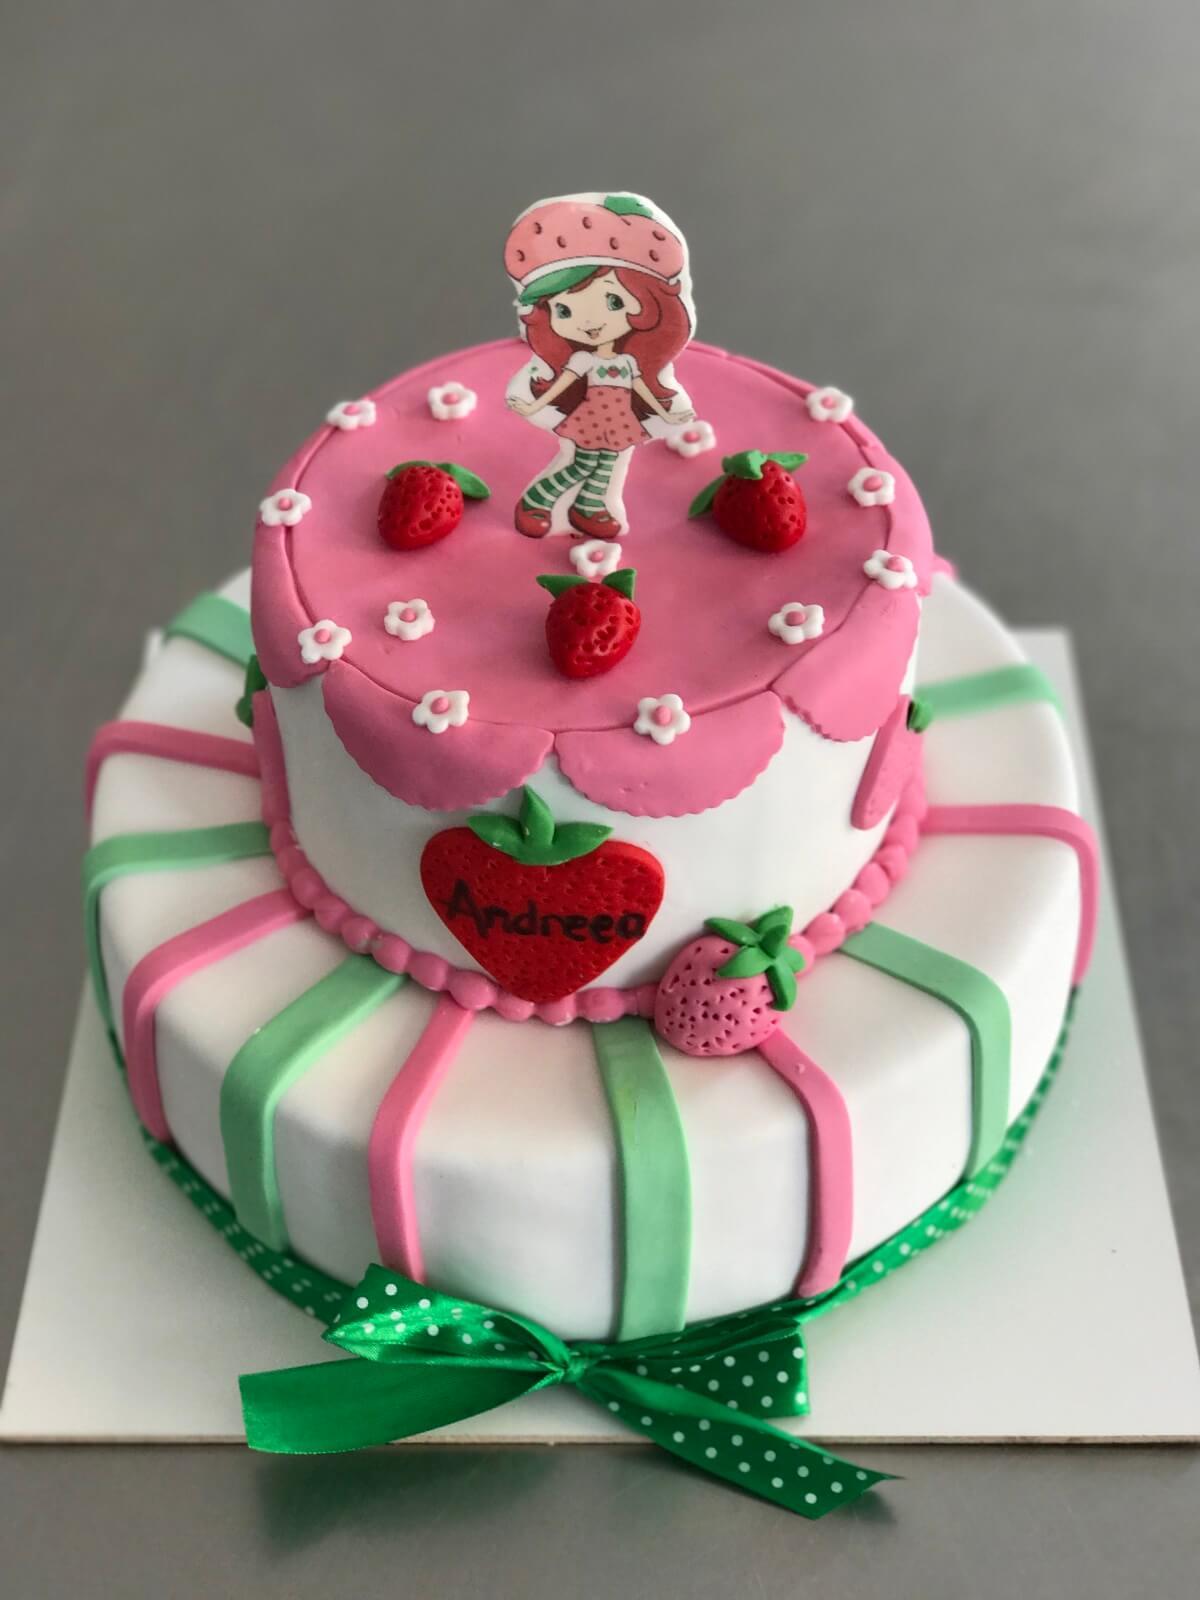 tort_fetițe_căpșunica_bdelicious_brasov_candybar_cupcakes_prajituri